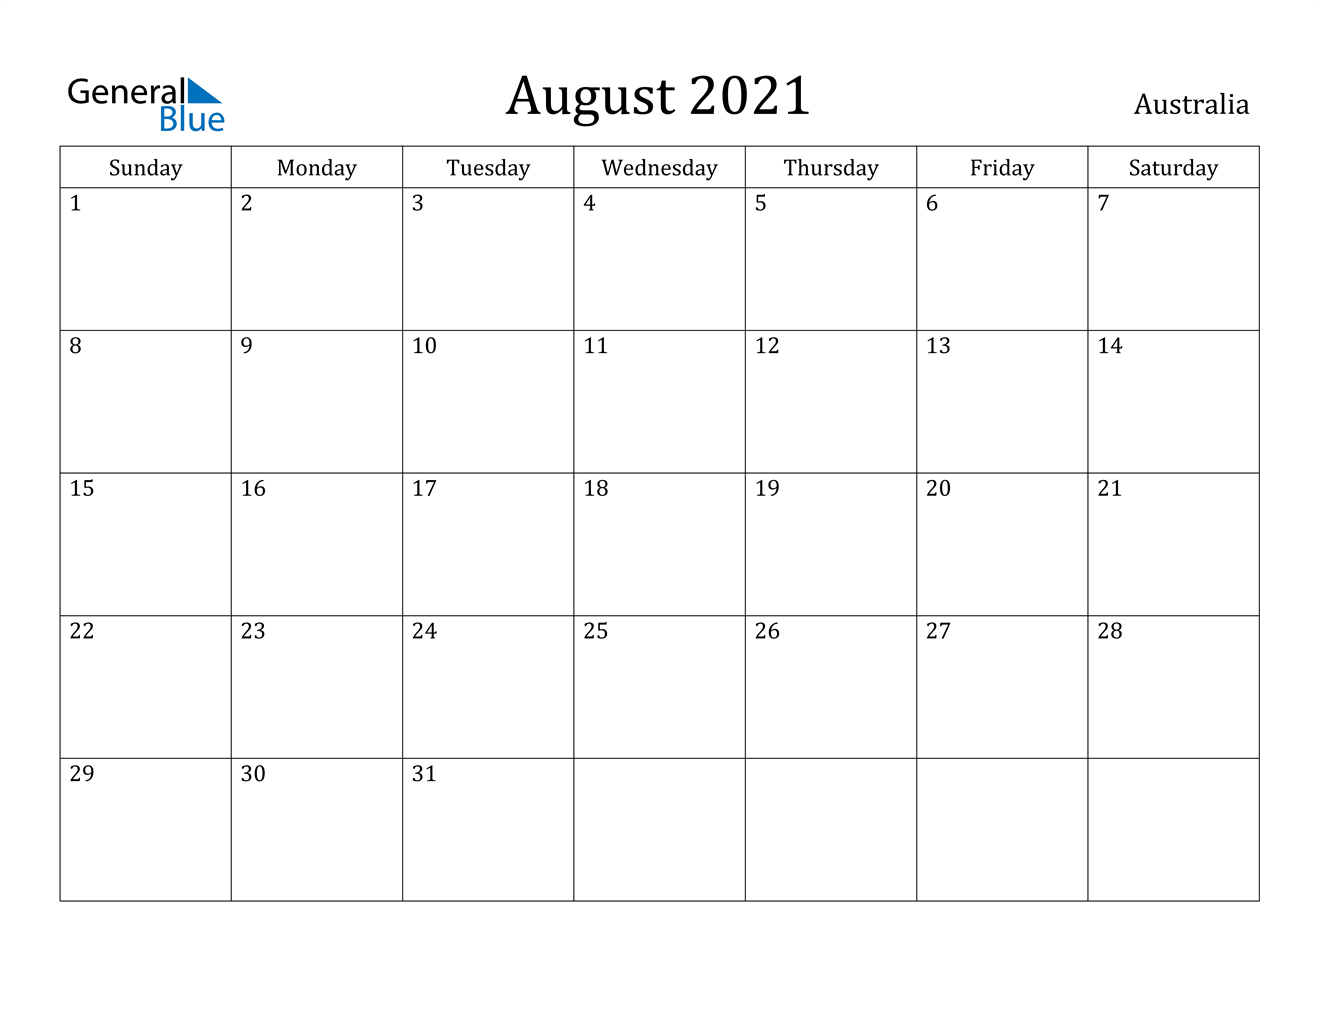 August 2021 Calendar - Australia